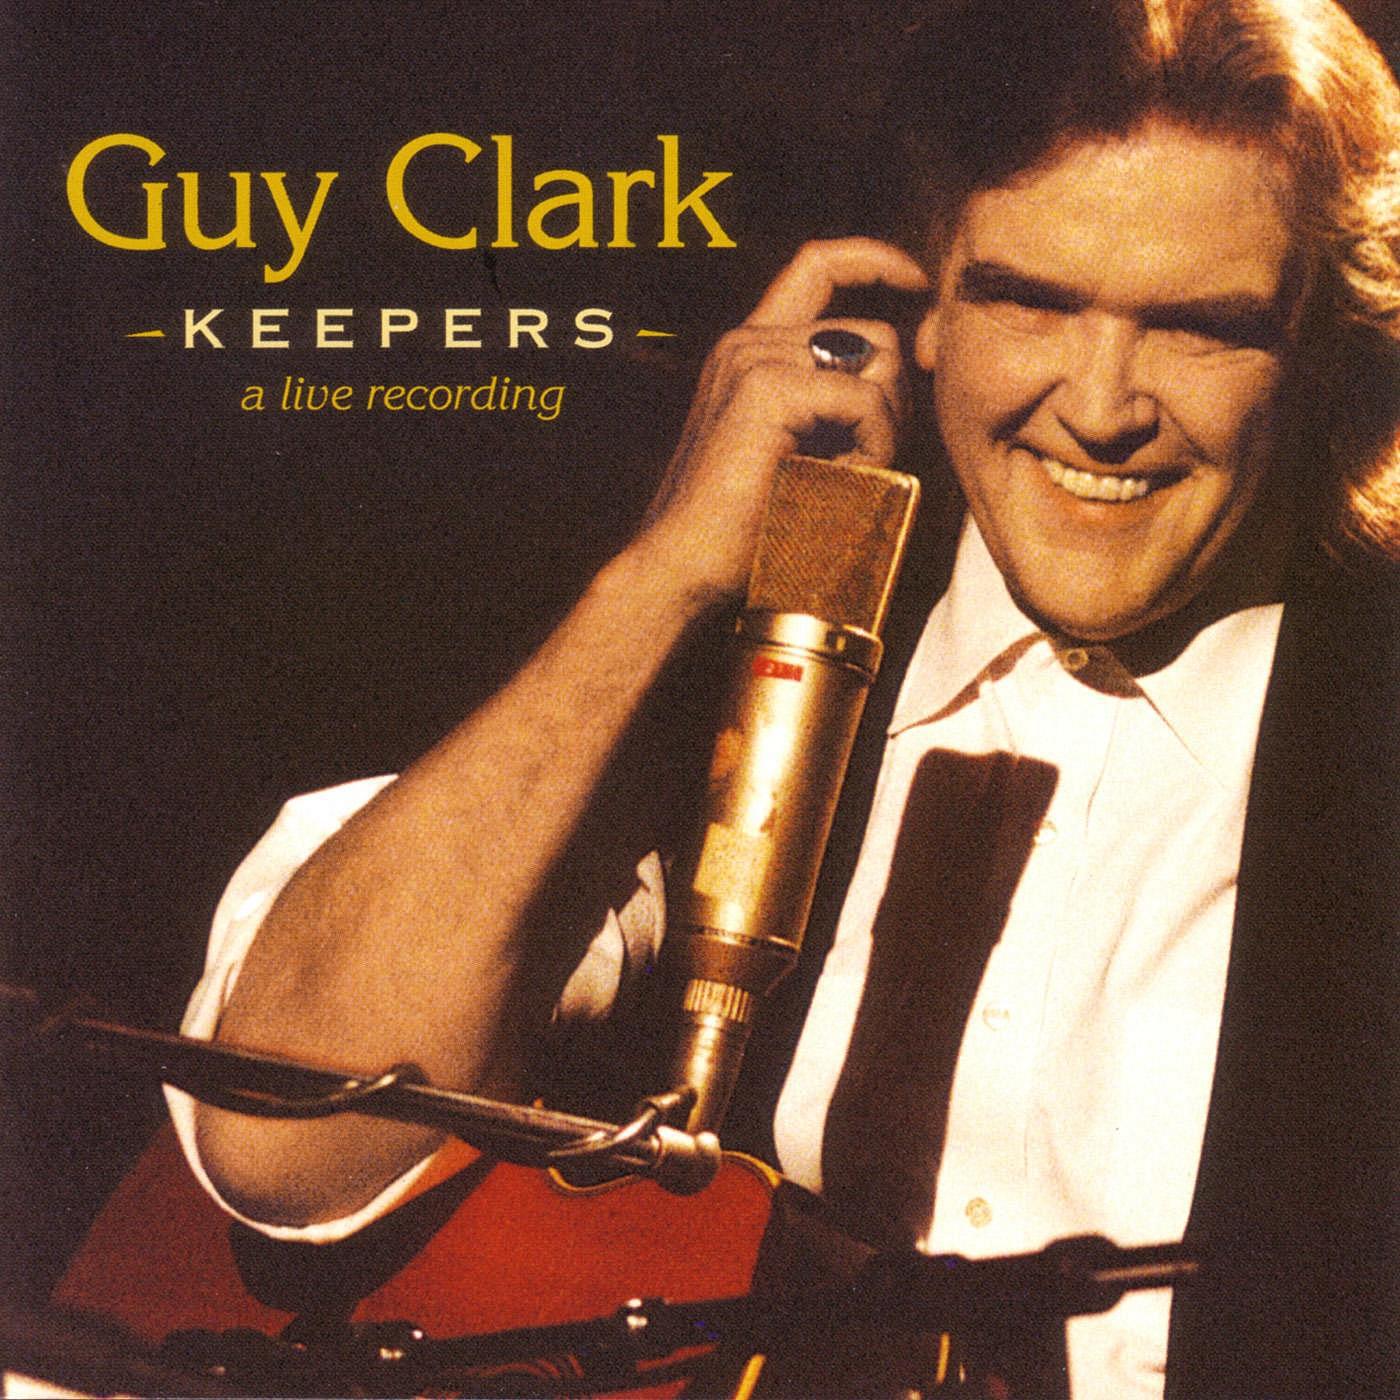 Listen Free To Guy Clark Desperados Waiting For A Train Radio Iheartradio